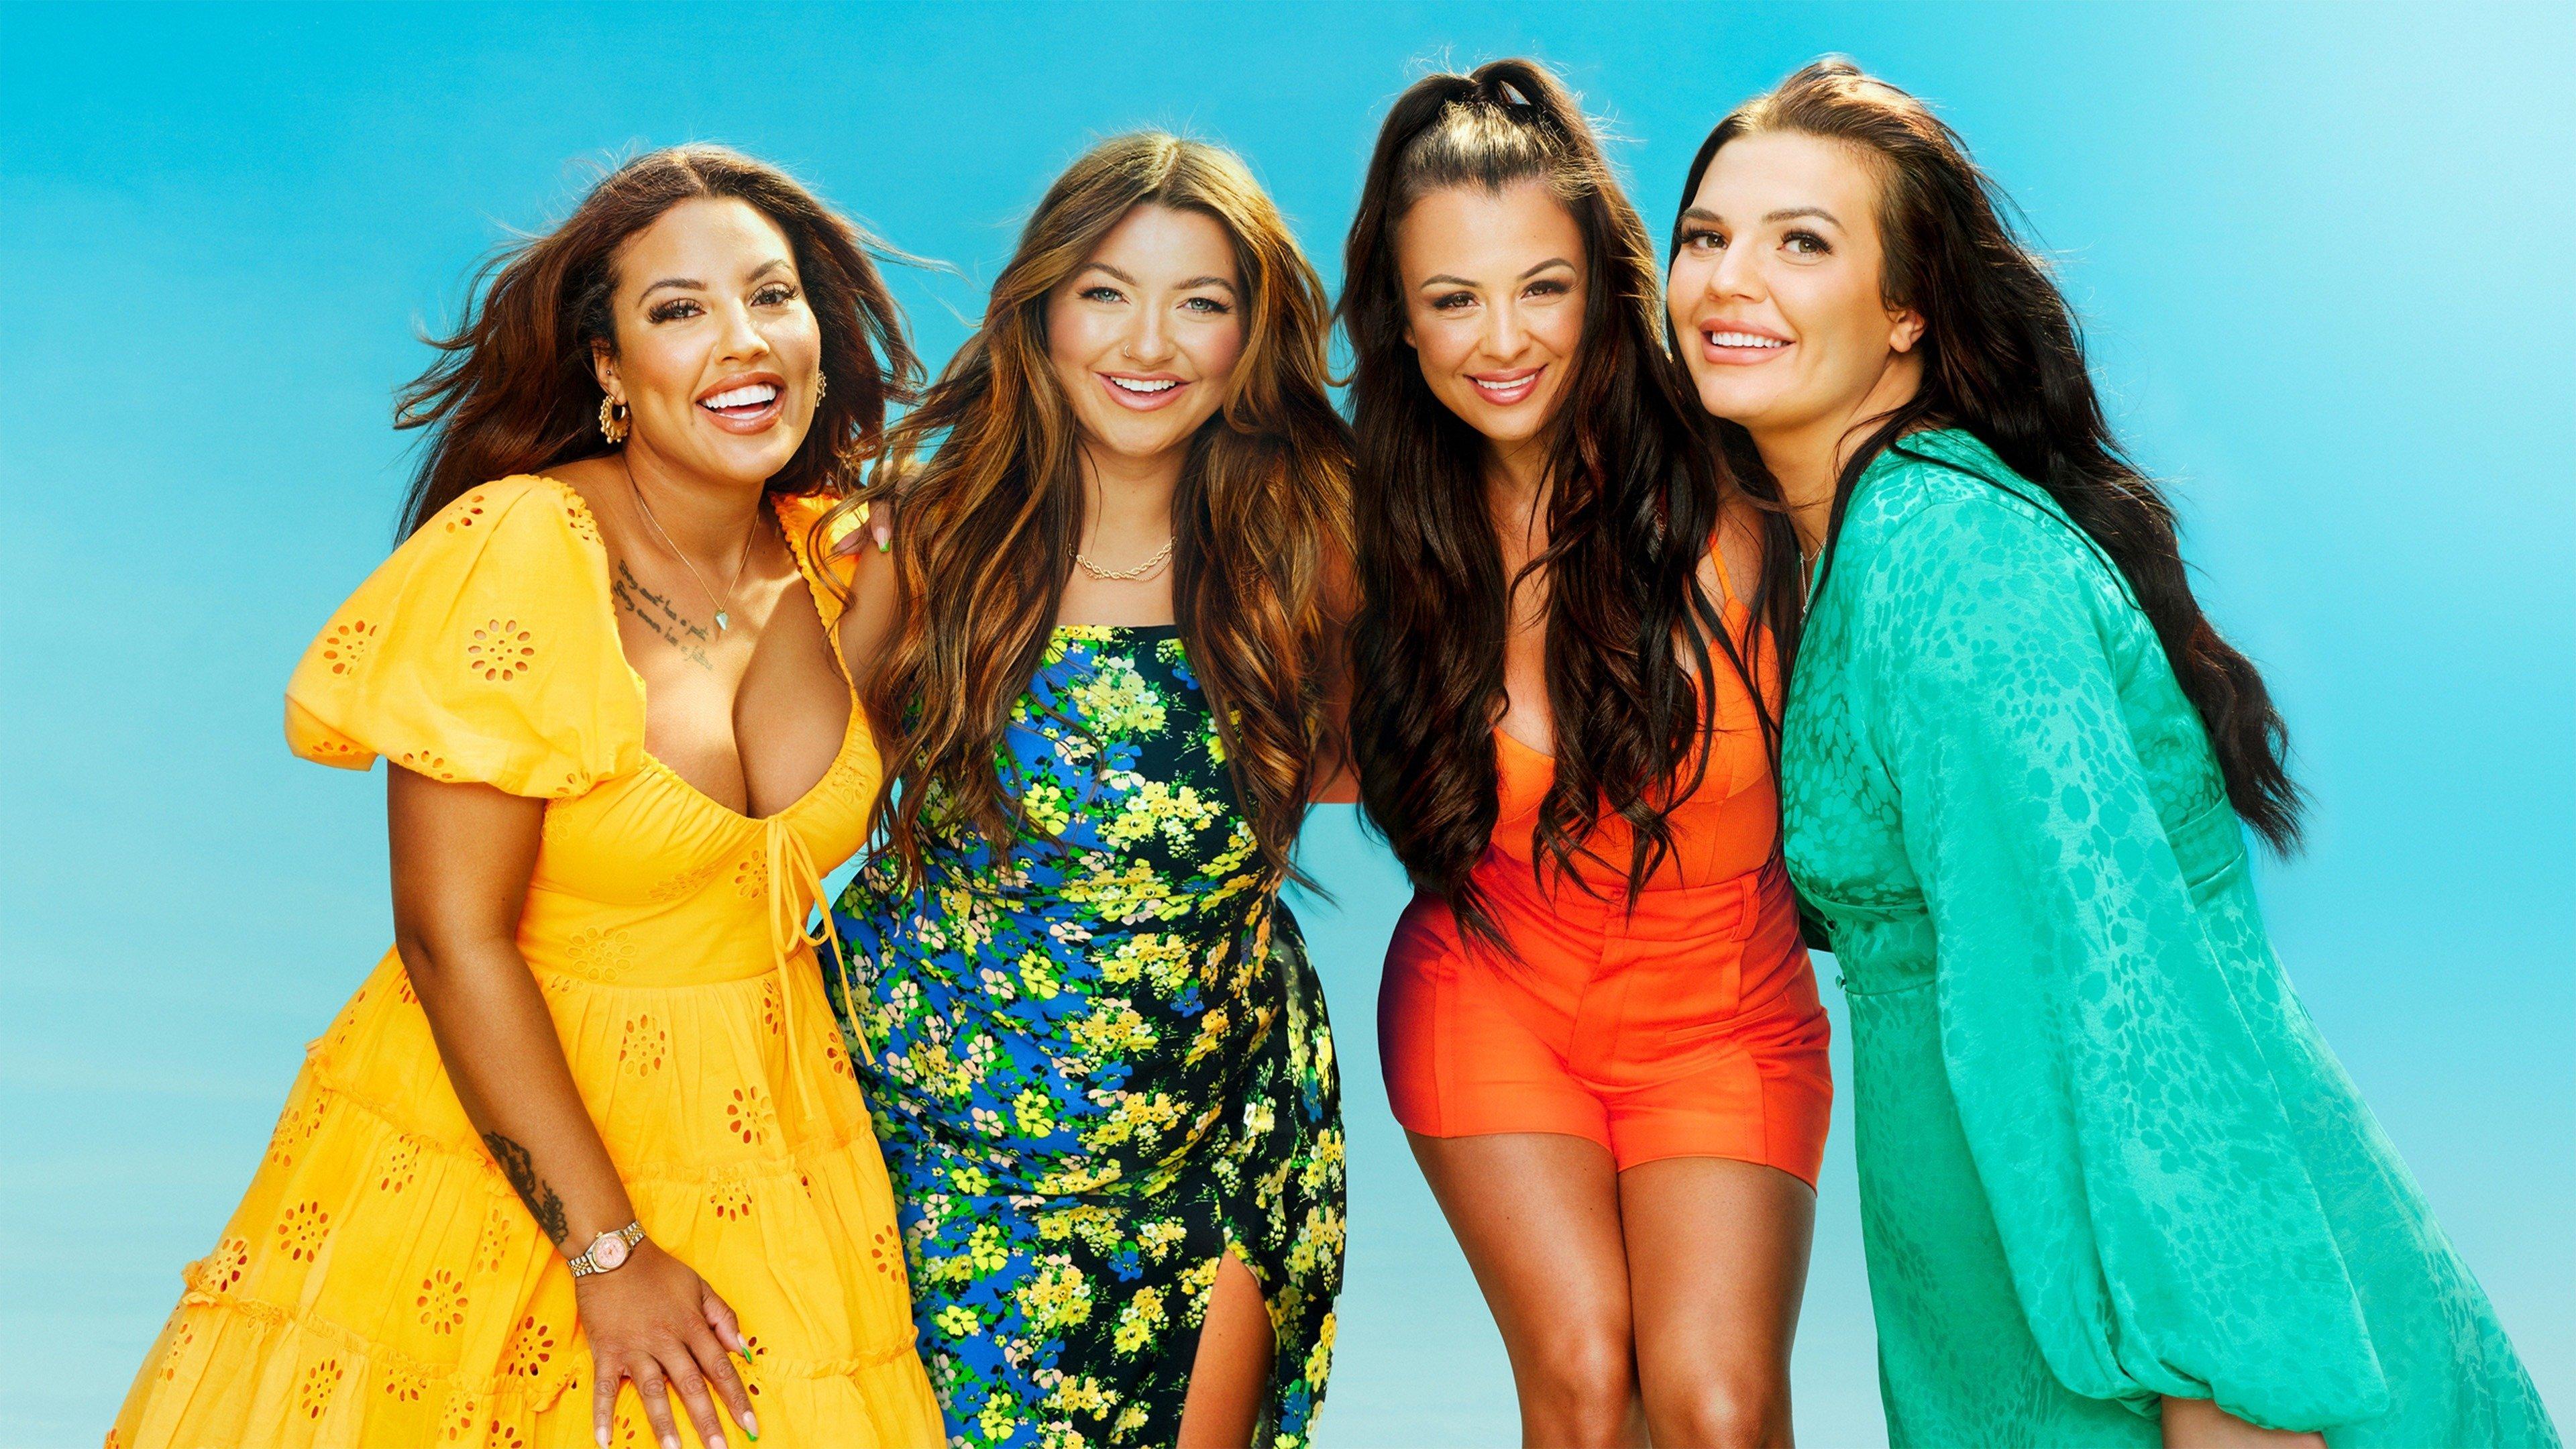 Teen Mom UK | Season 1 Episode 5 | Sky com